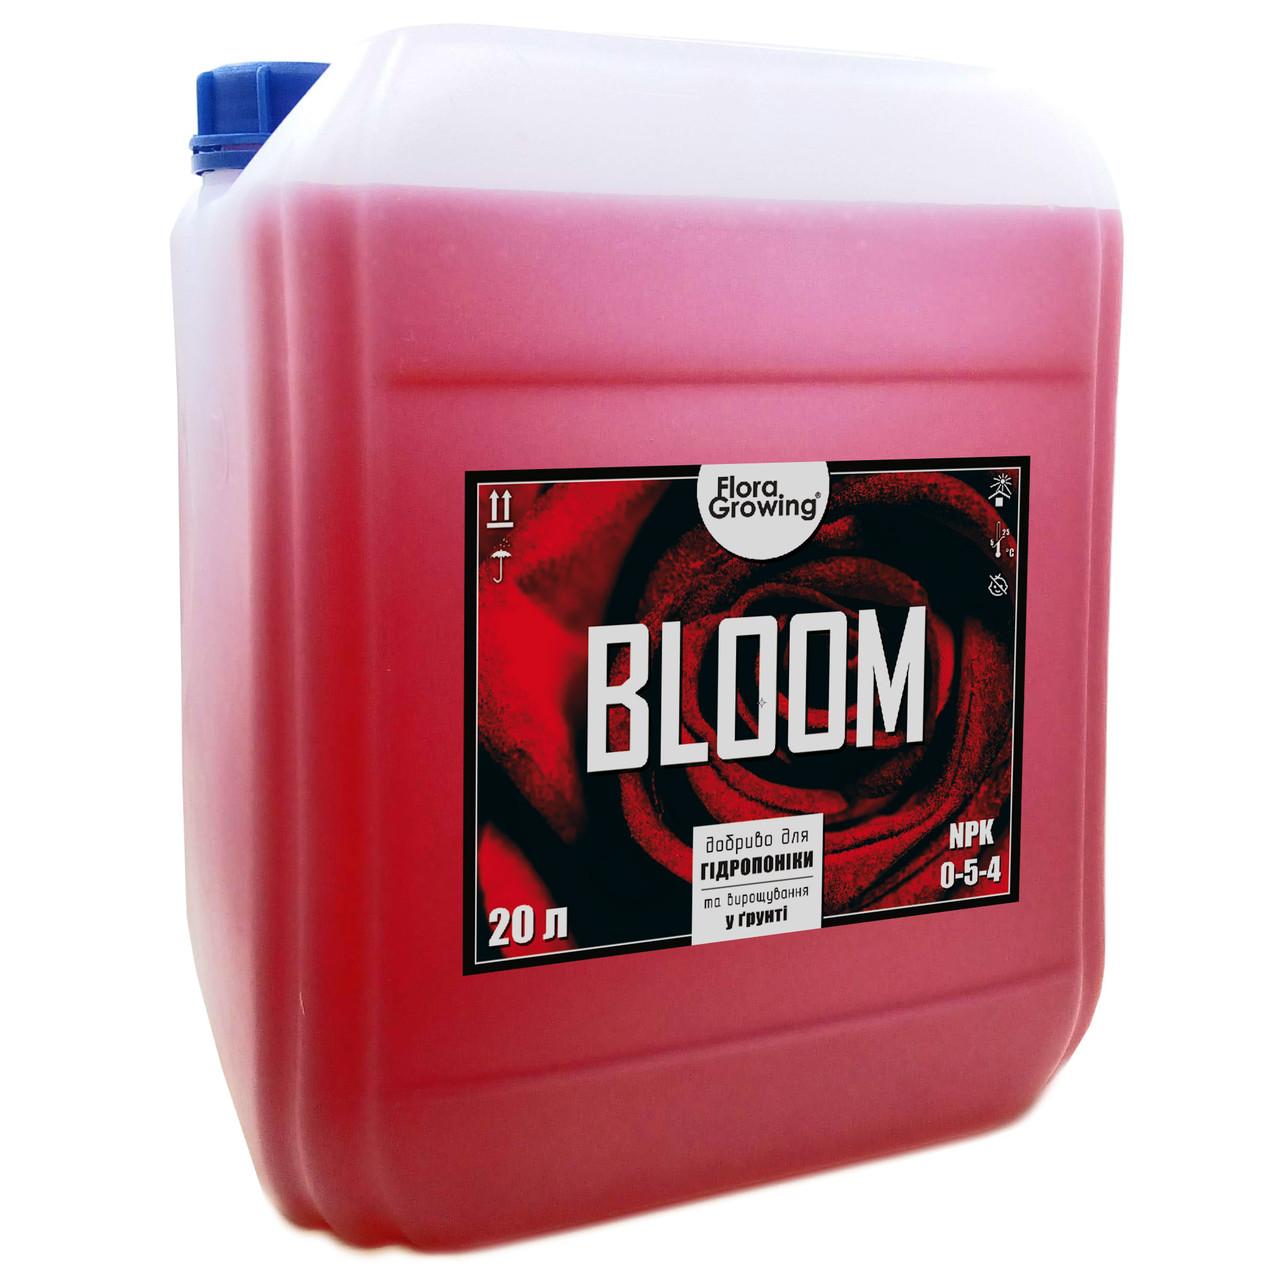 20 л Bloom - компонент удобрений для гидропоники и почвы аналог GHE